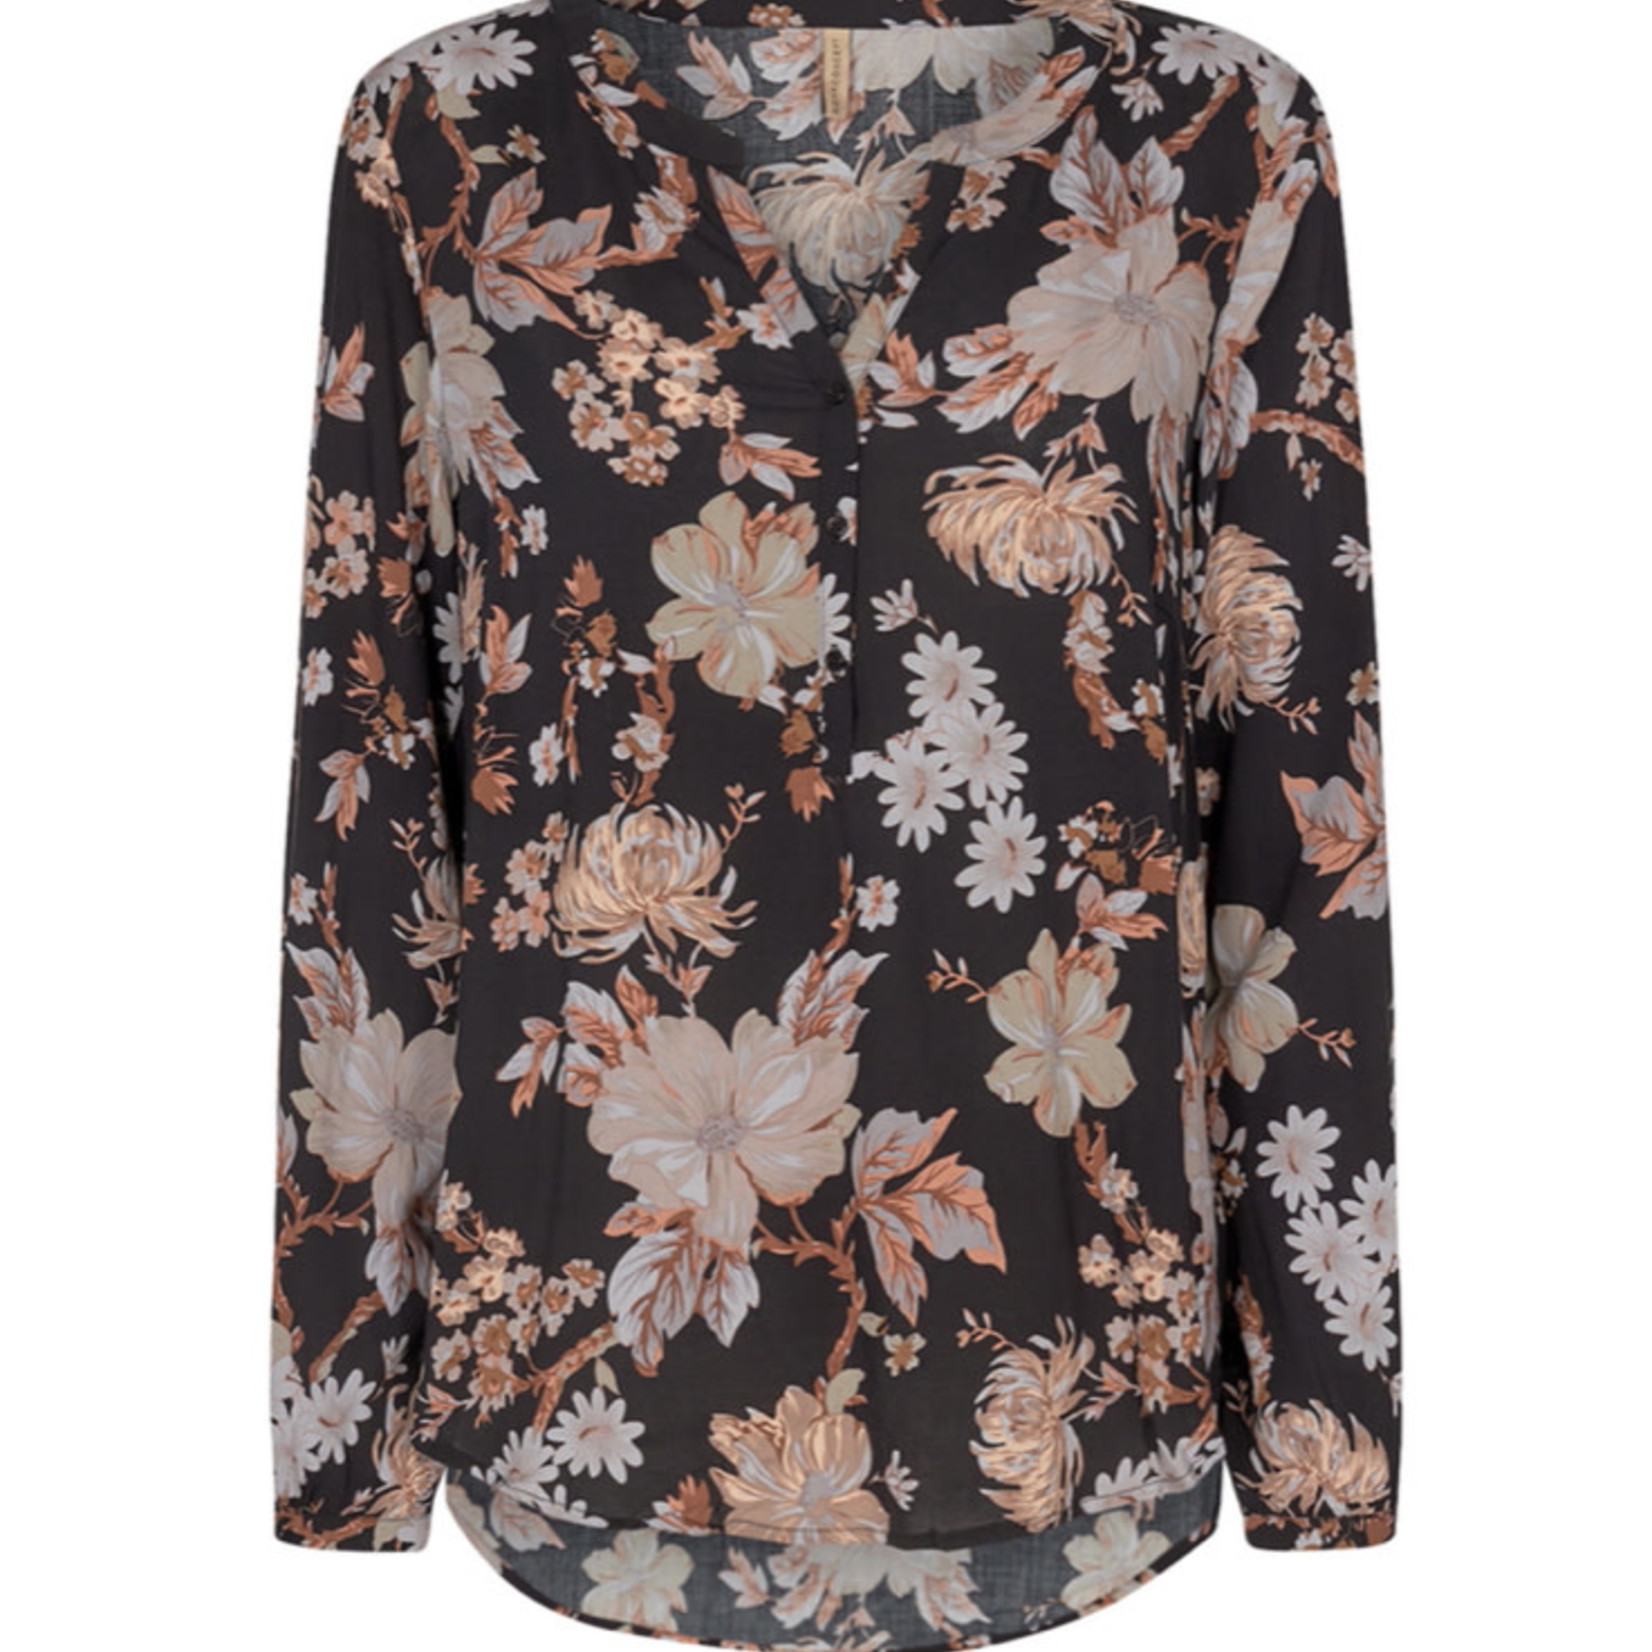 SoyaConcept LS Floral Button Down